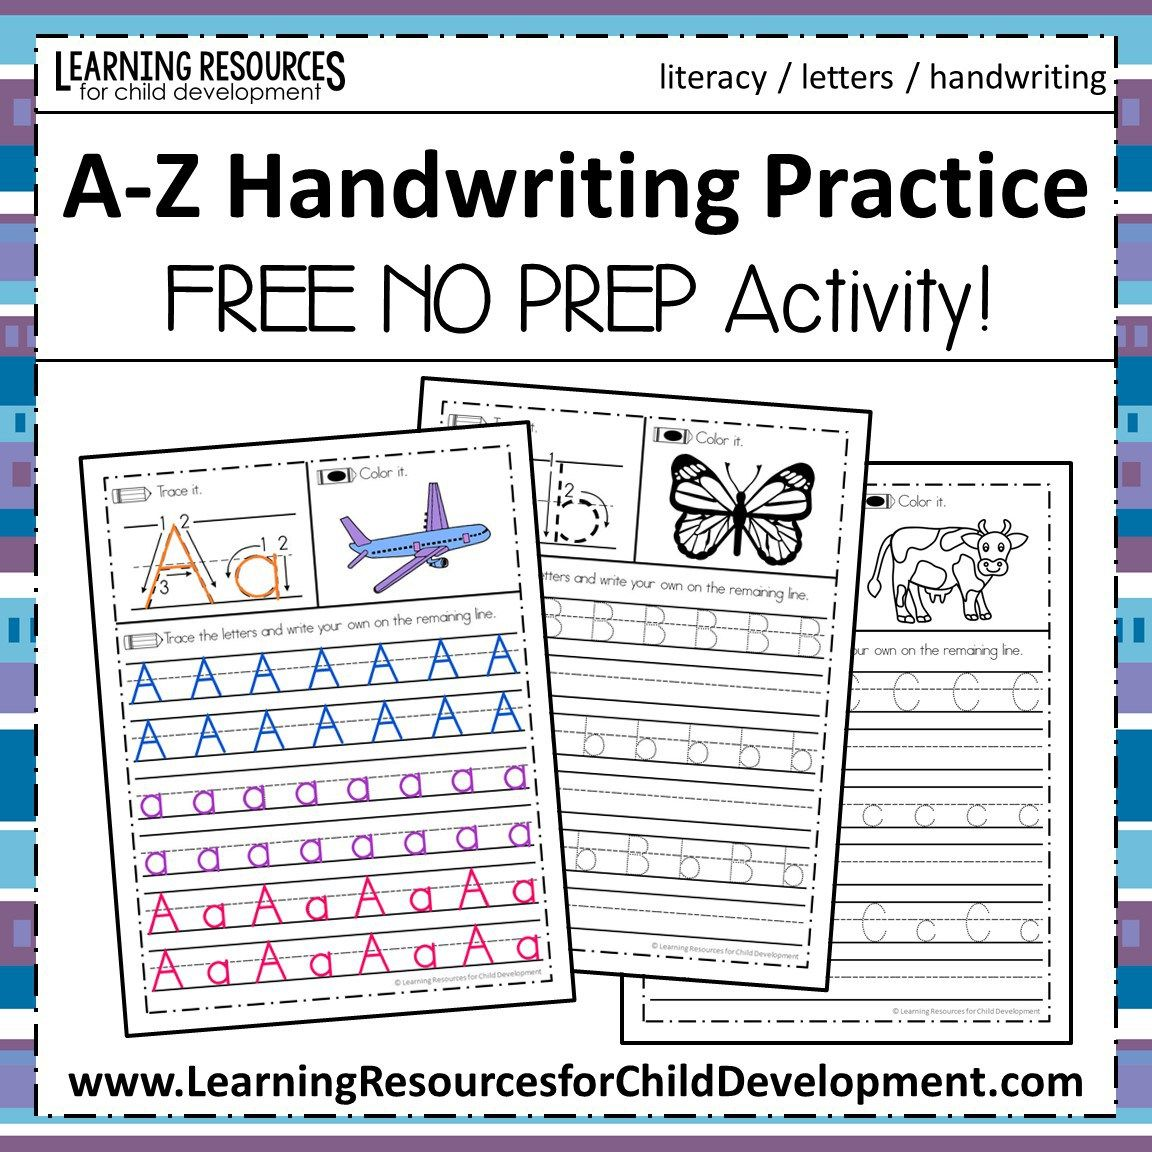 A Z Handwriting Practice No Prep Worksheets For Learning Letters Kids Handwriting Practice Handwriting Practice Free Handwriting Practice Worksheets [ 1152 x 1152 Pixel ]